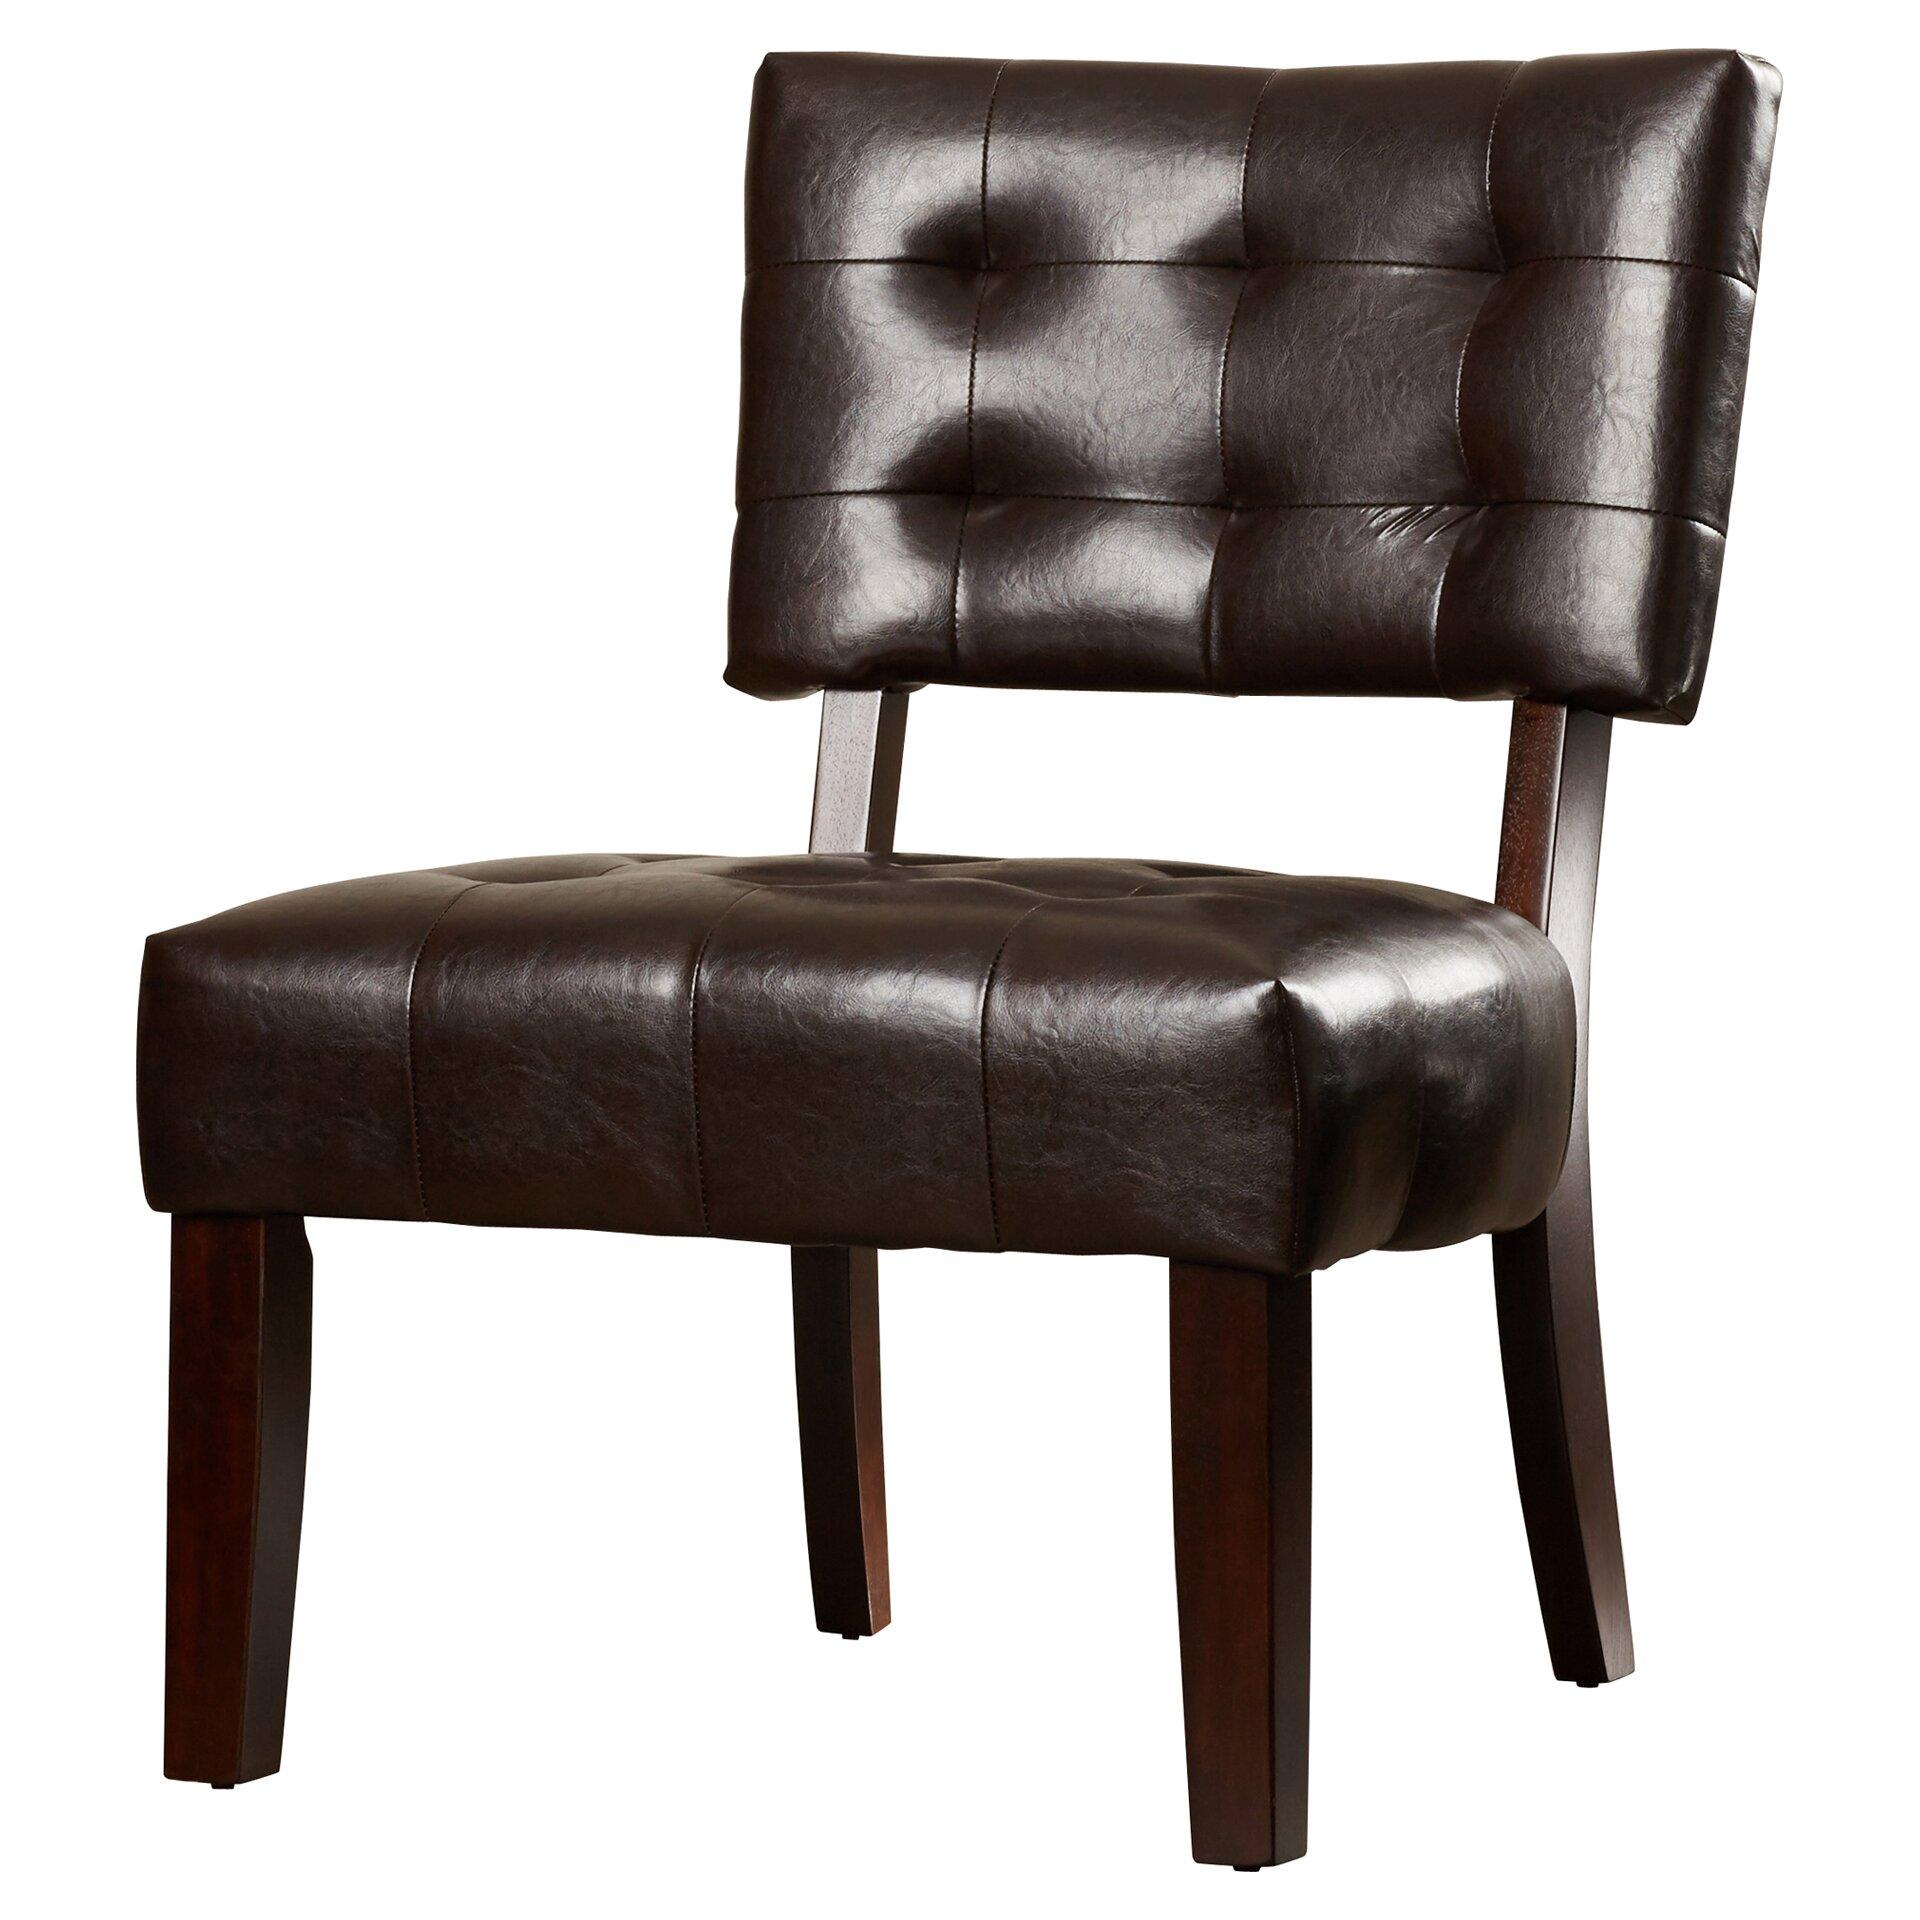 Varick Gallery Modern Vinyl Slipper Chair Amp Reviews Wayfair